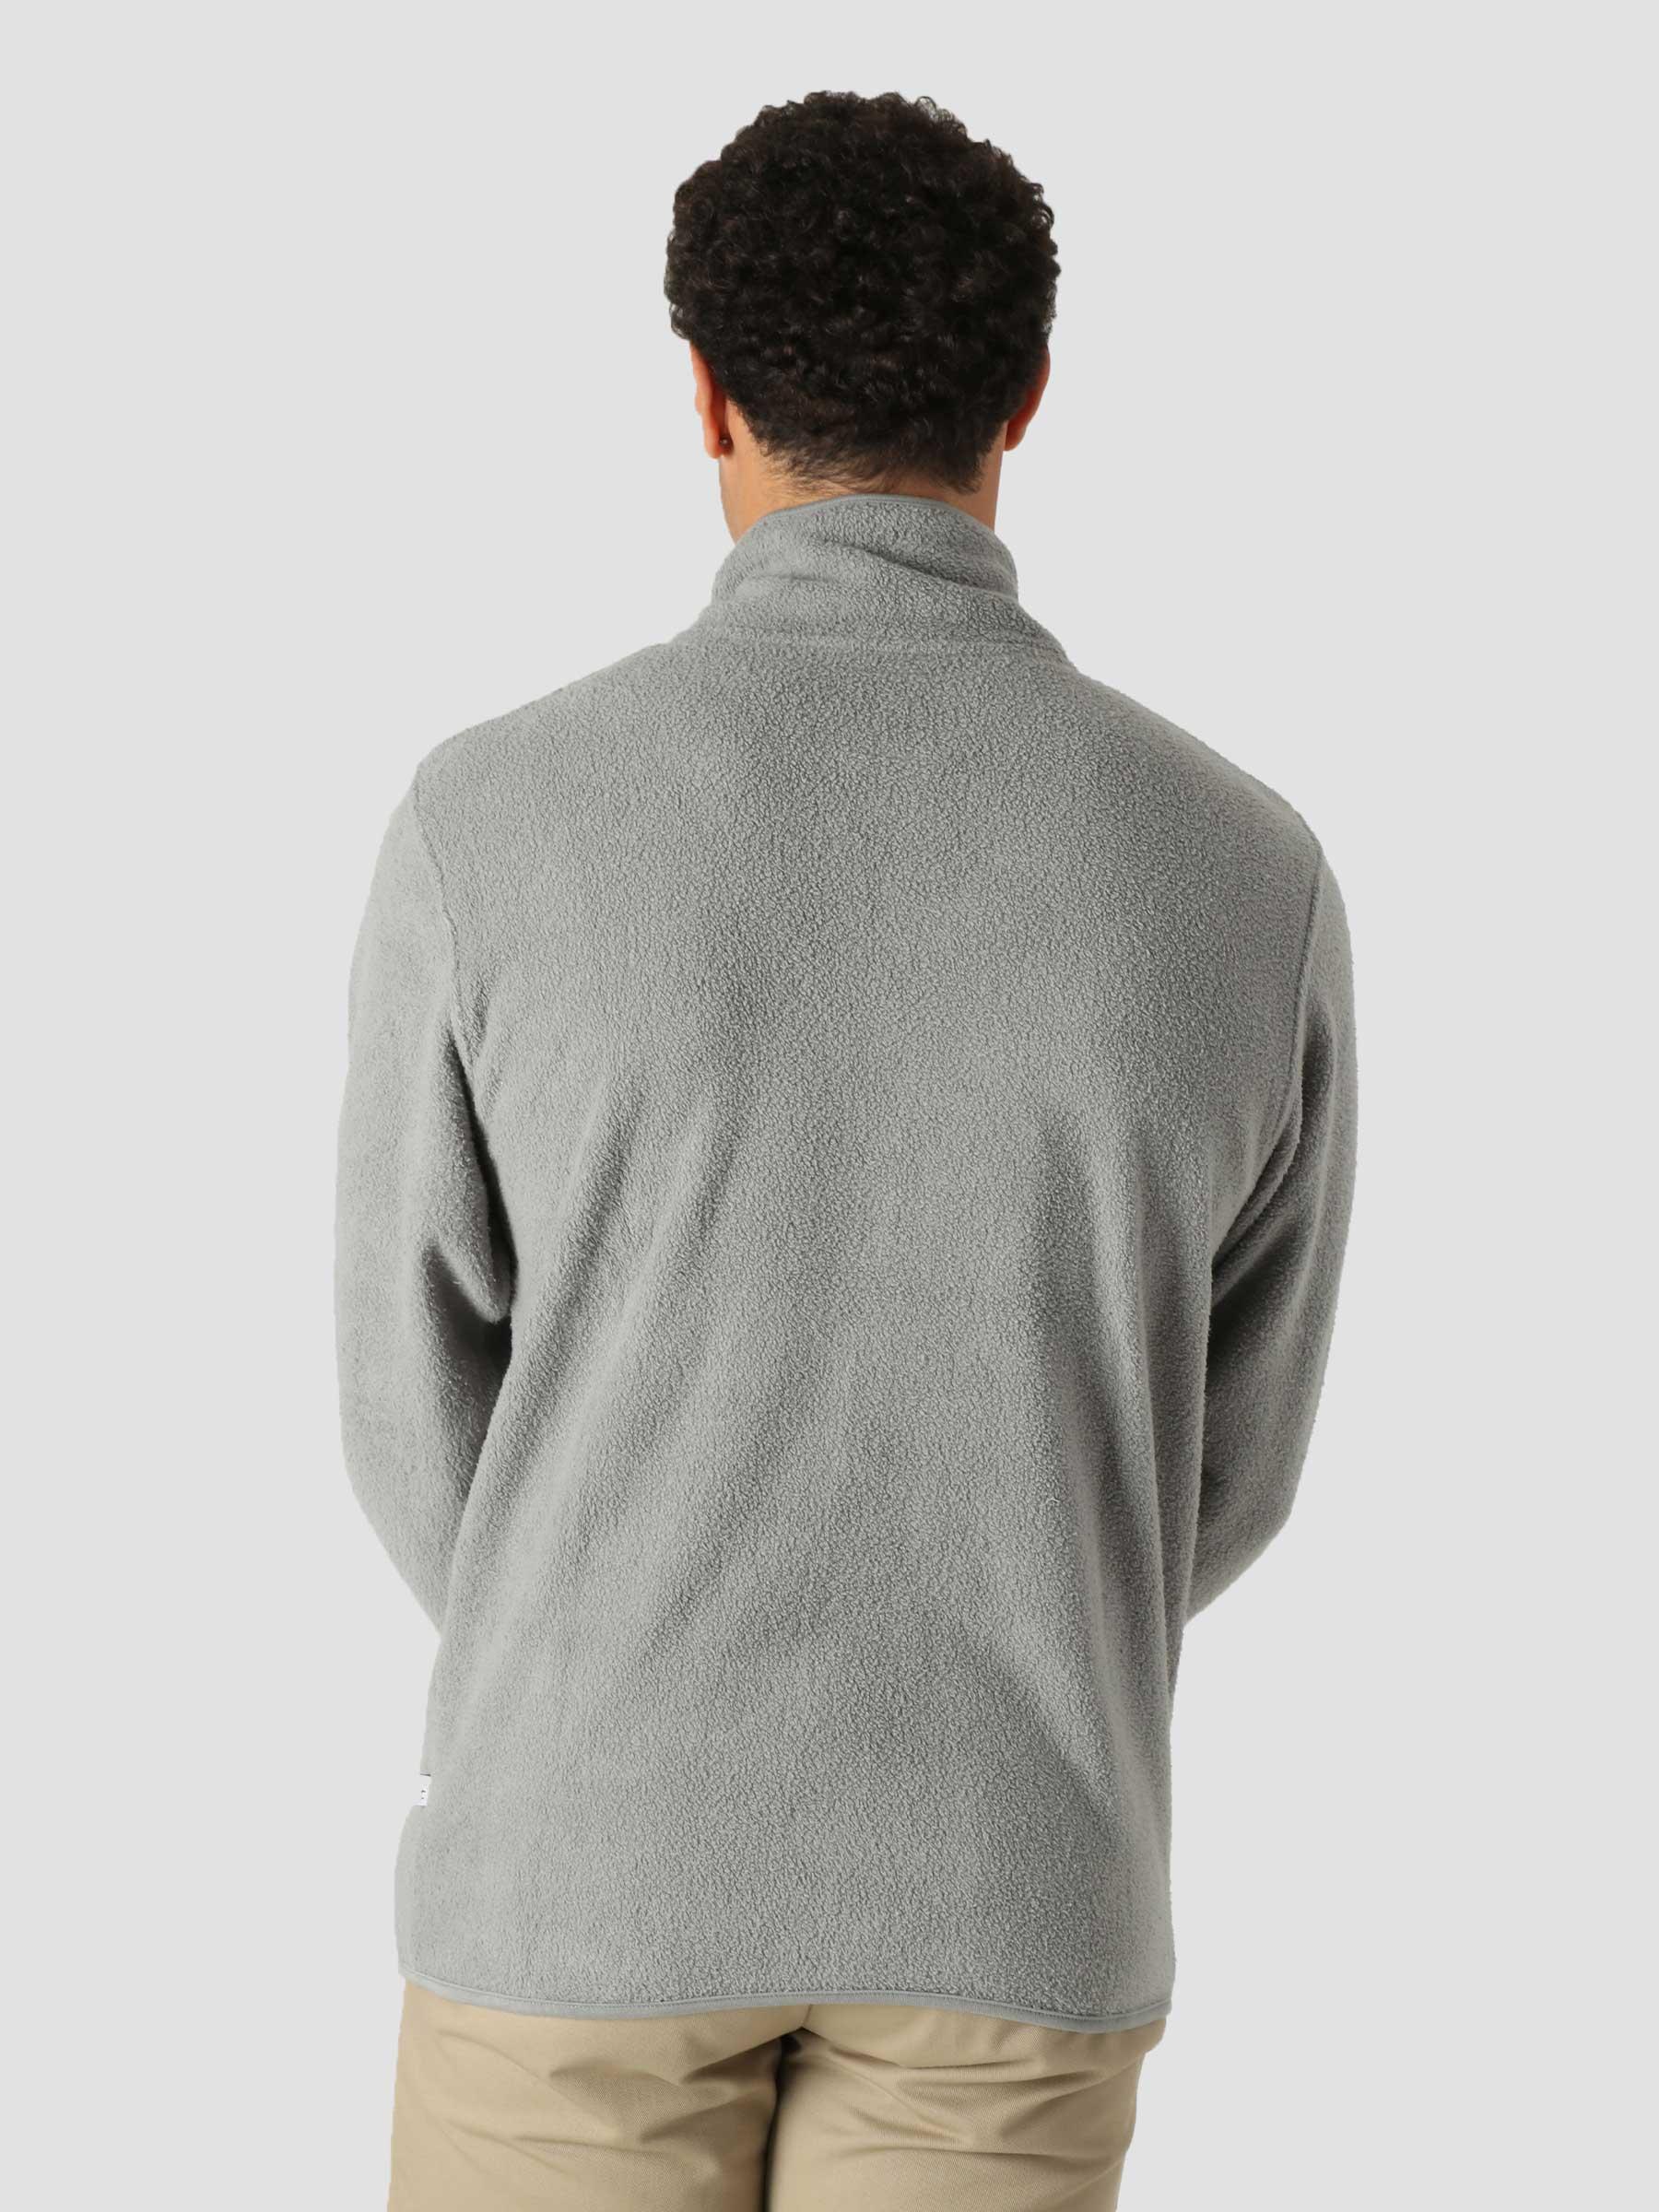 QB97 Full Zip Track Fleece Grey Heather